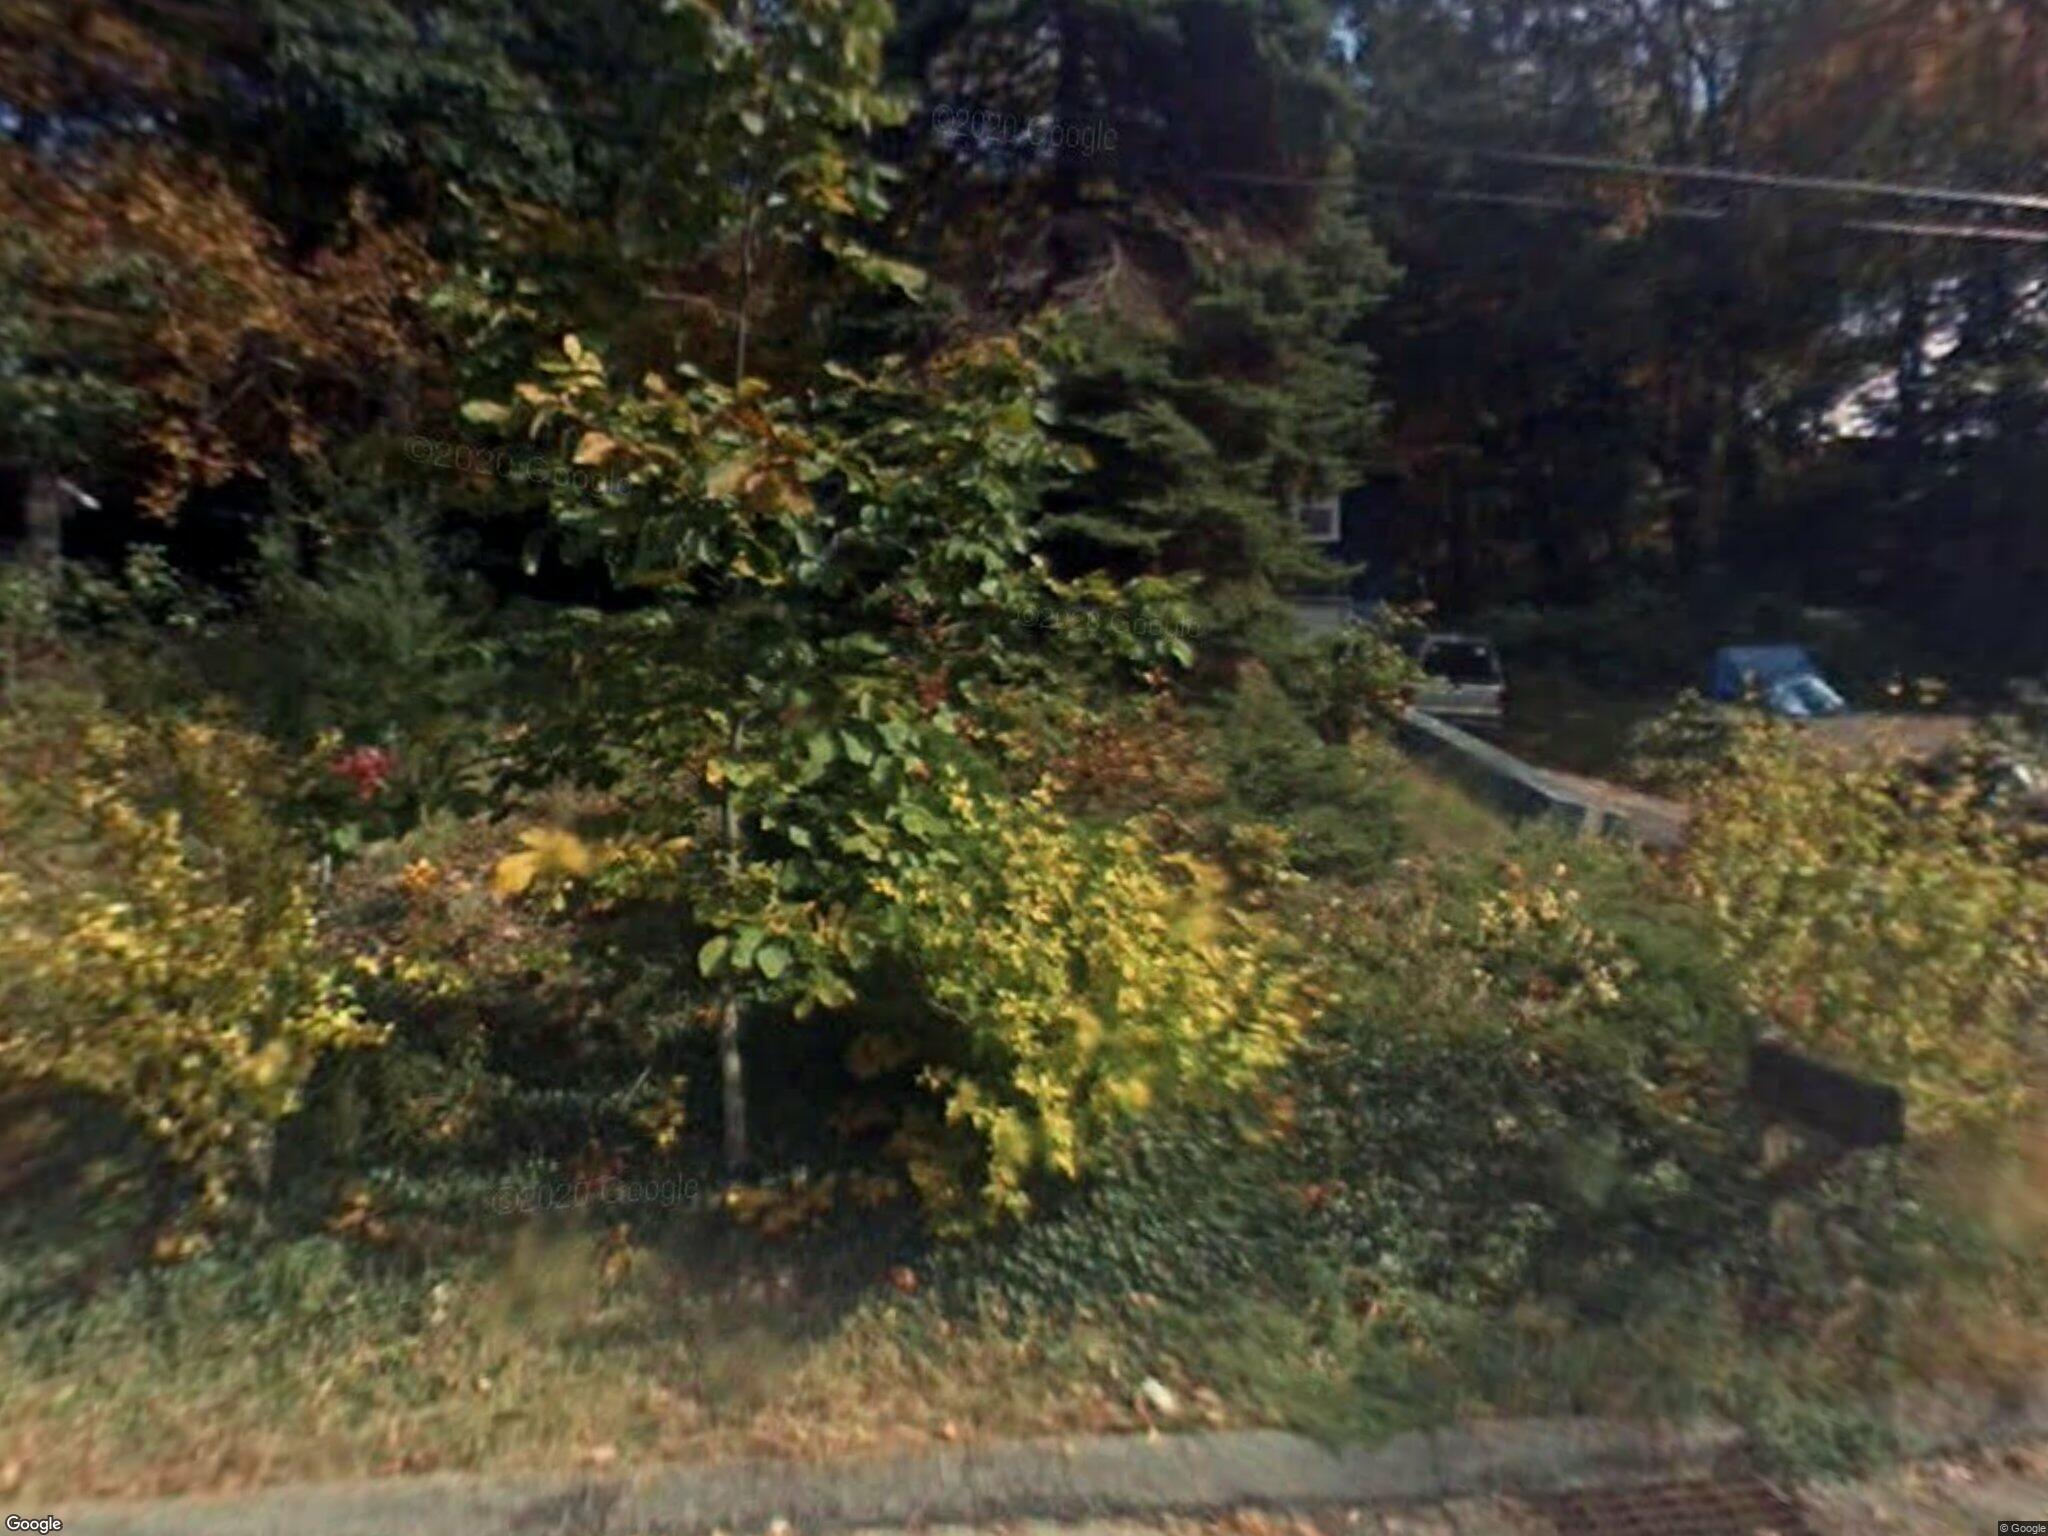 28 Laurel Leaf Dr, Gales Ferry, CT 06335 | Trulia